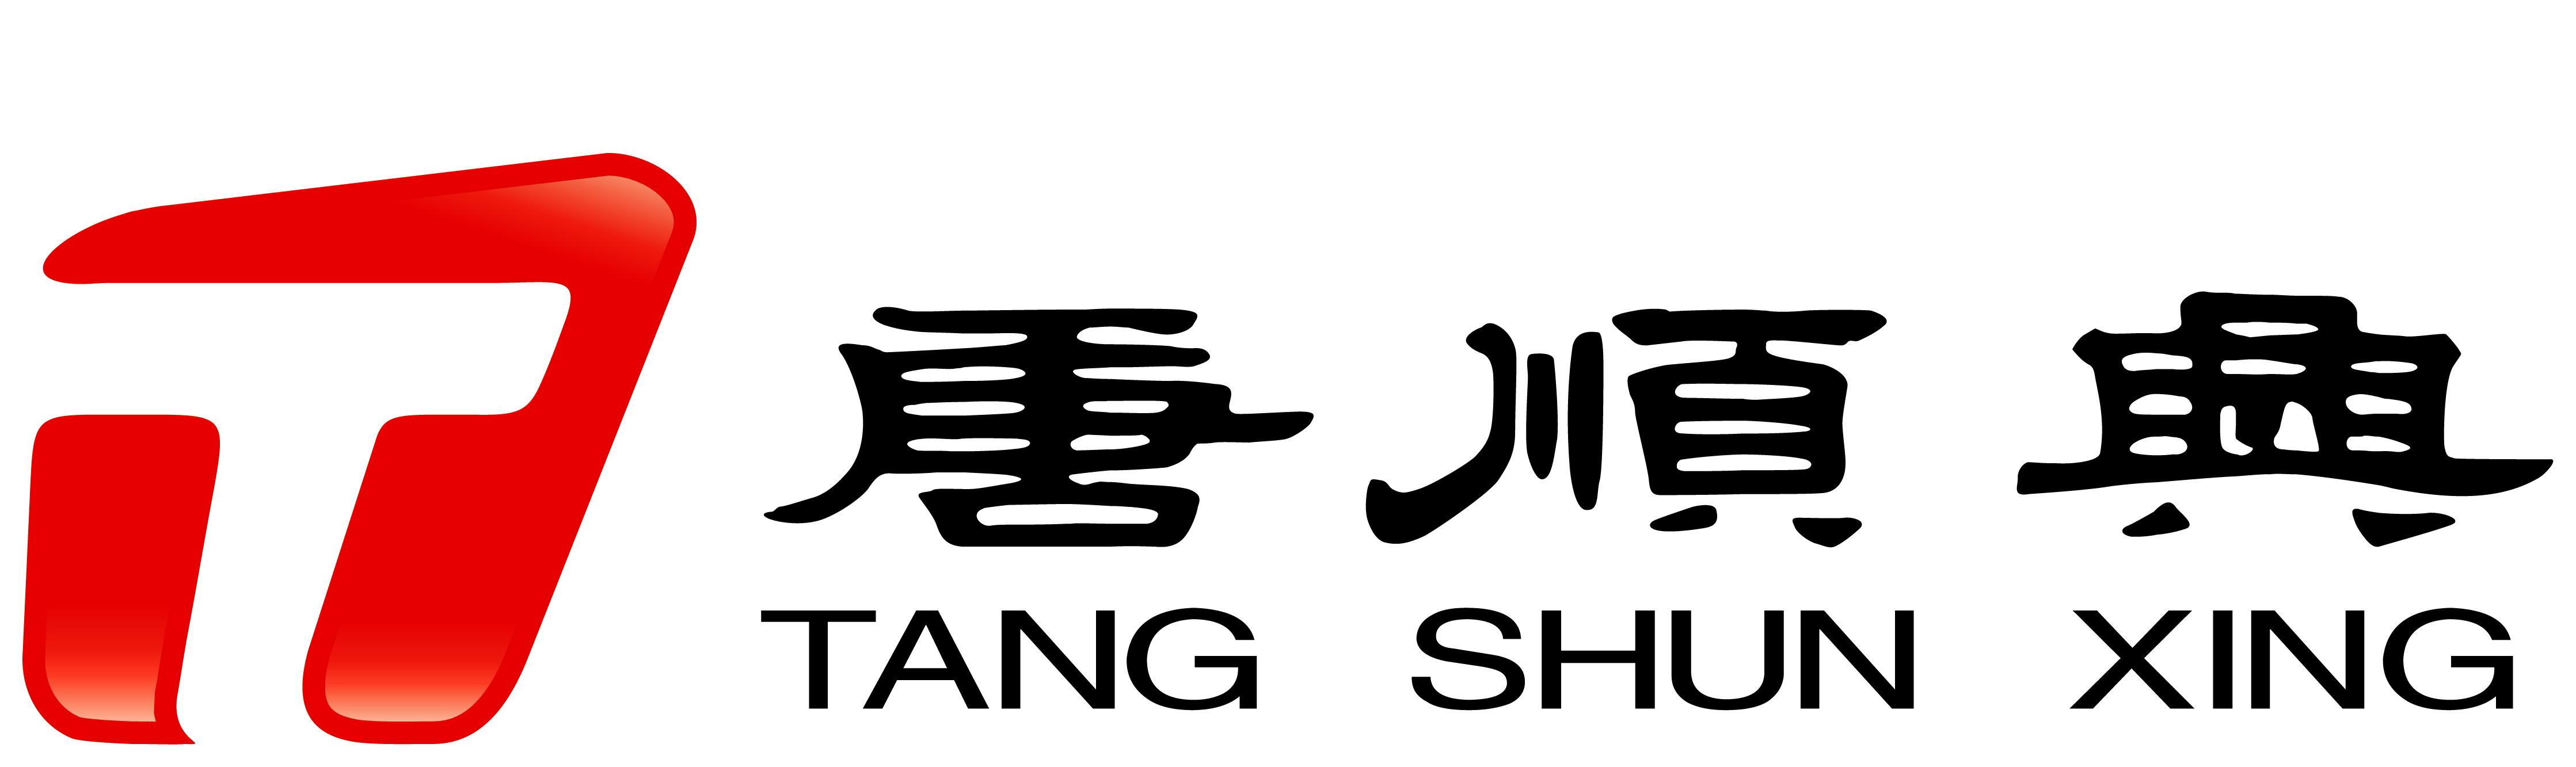 food scheme 2018 gold Tong Shun Hing